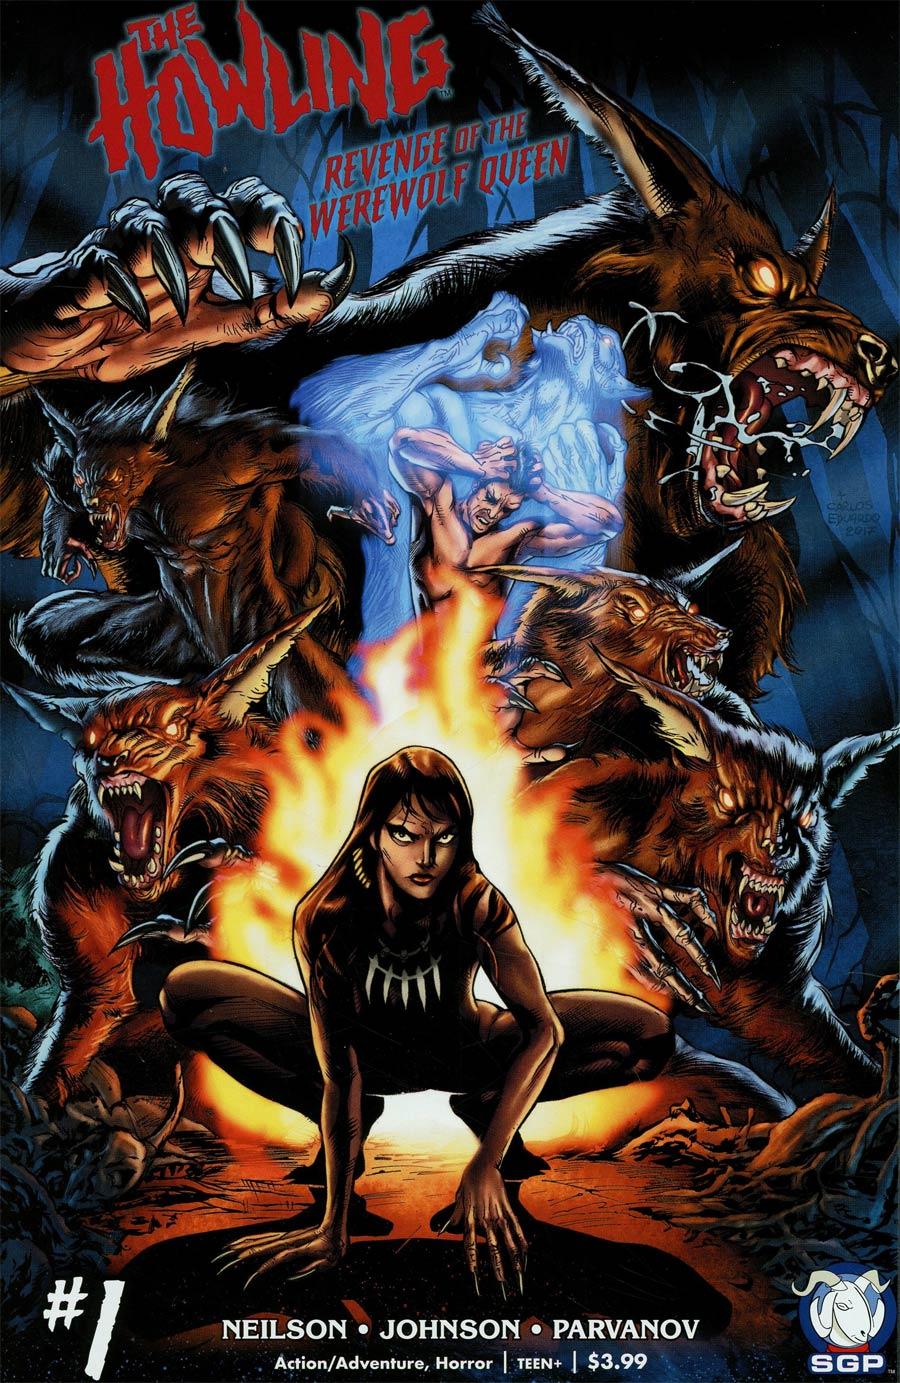 Howling Revenge Of The Werewolf Queen #1 Cover A Regular Yvel Guichet & Carlos Eduardo Blu-ray Homage Cover